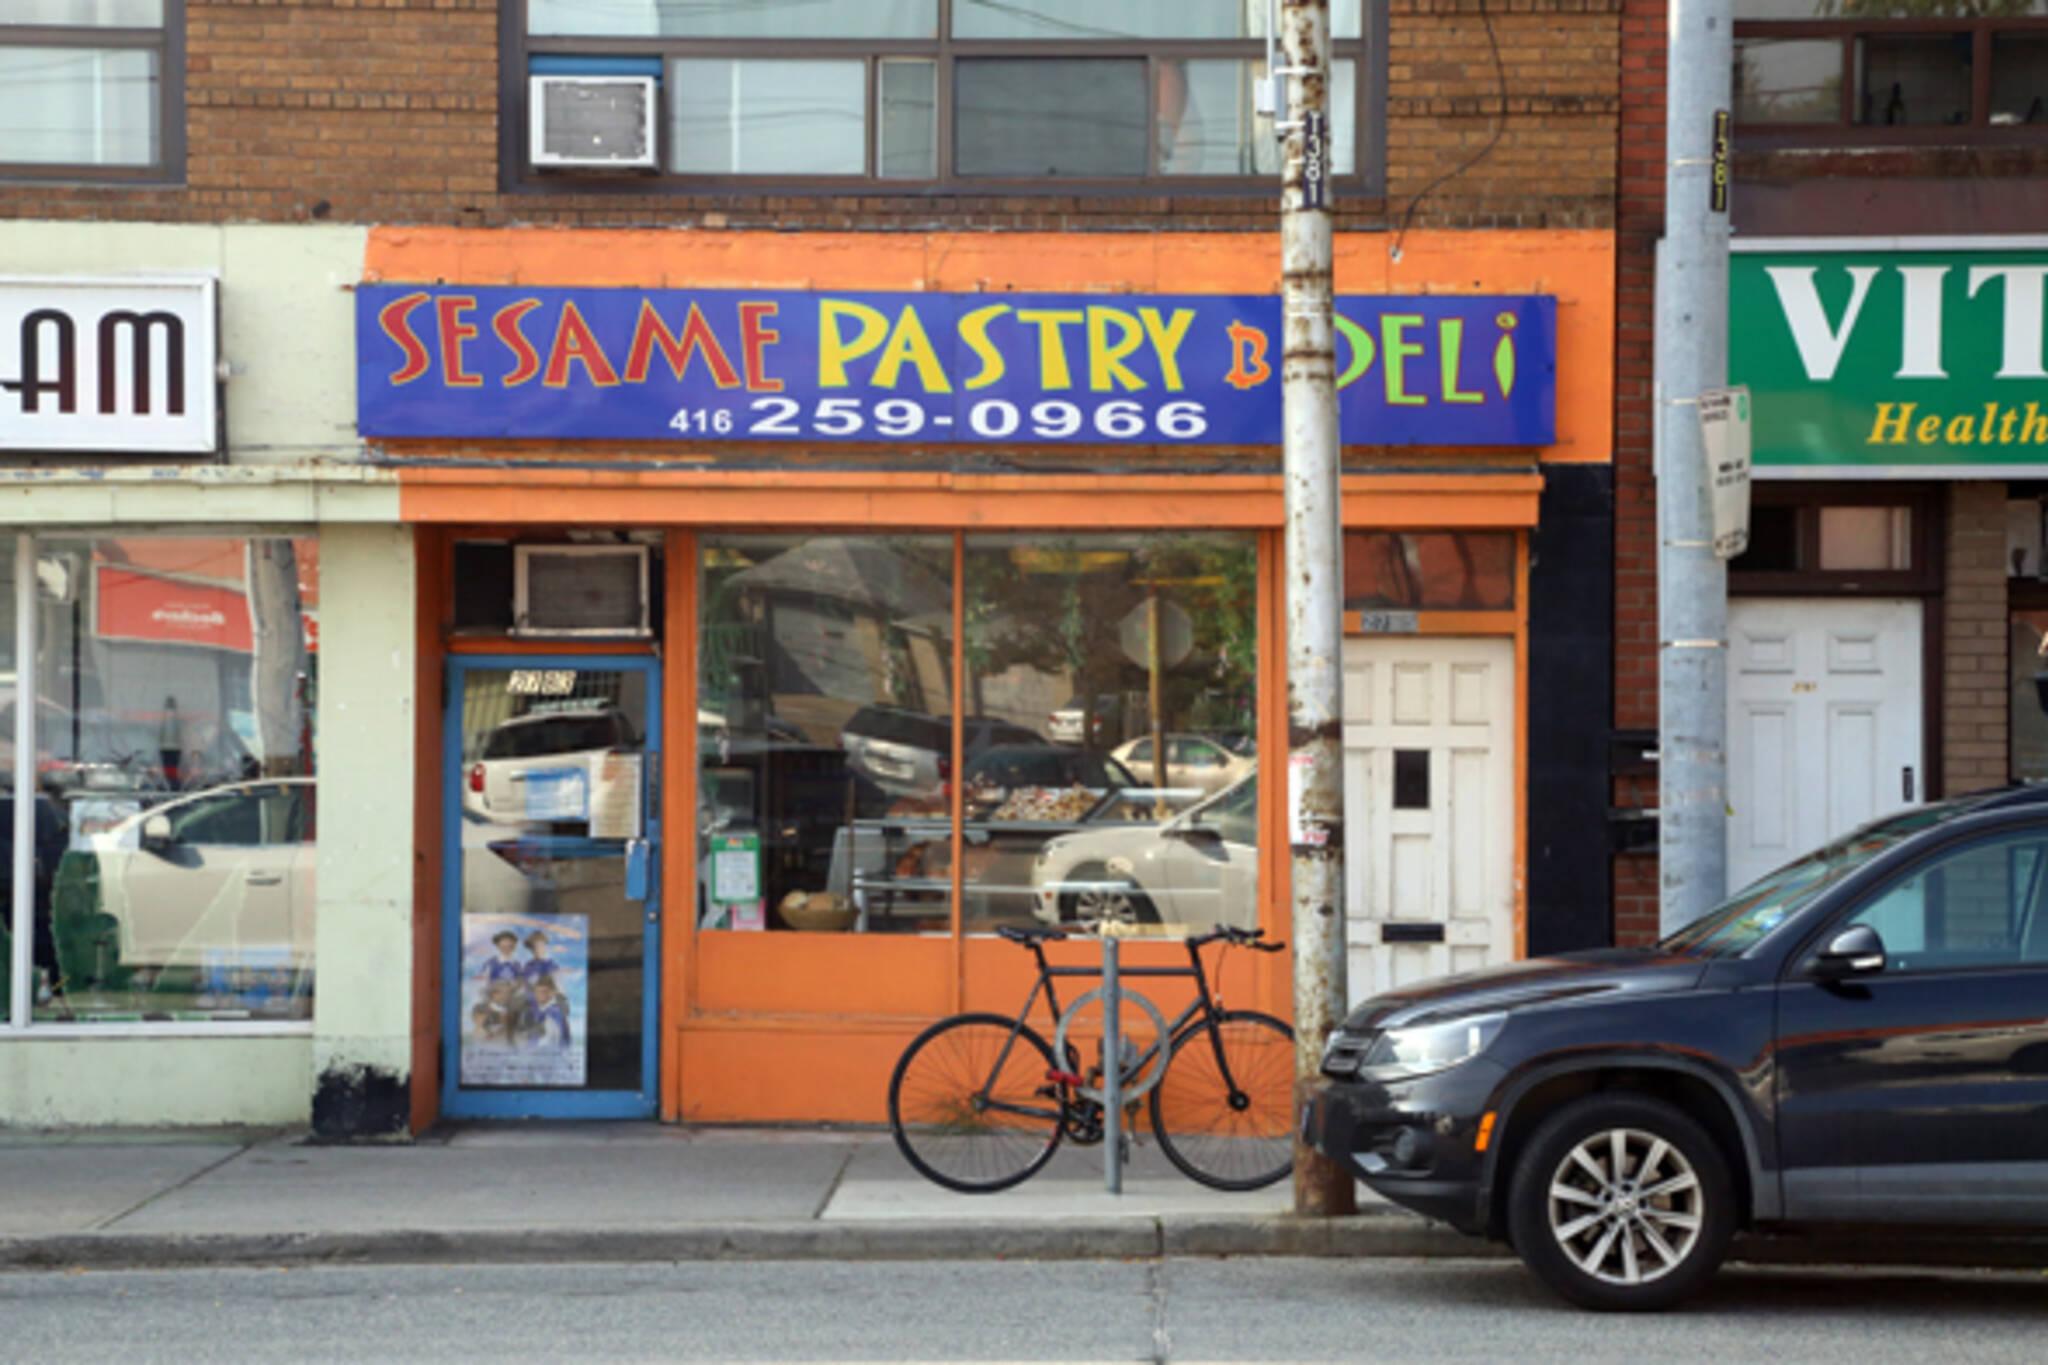 Sesame Pastry and Deli